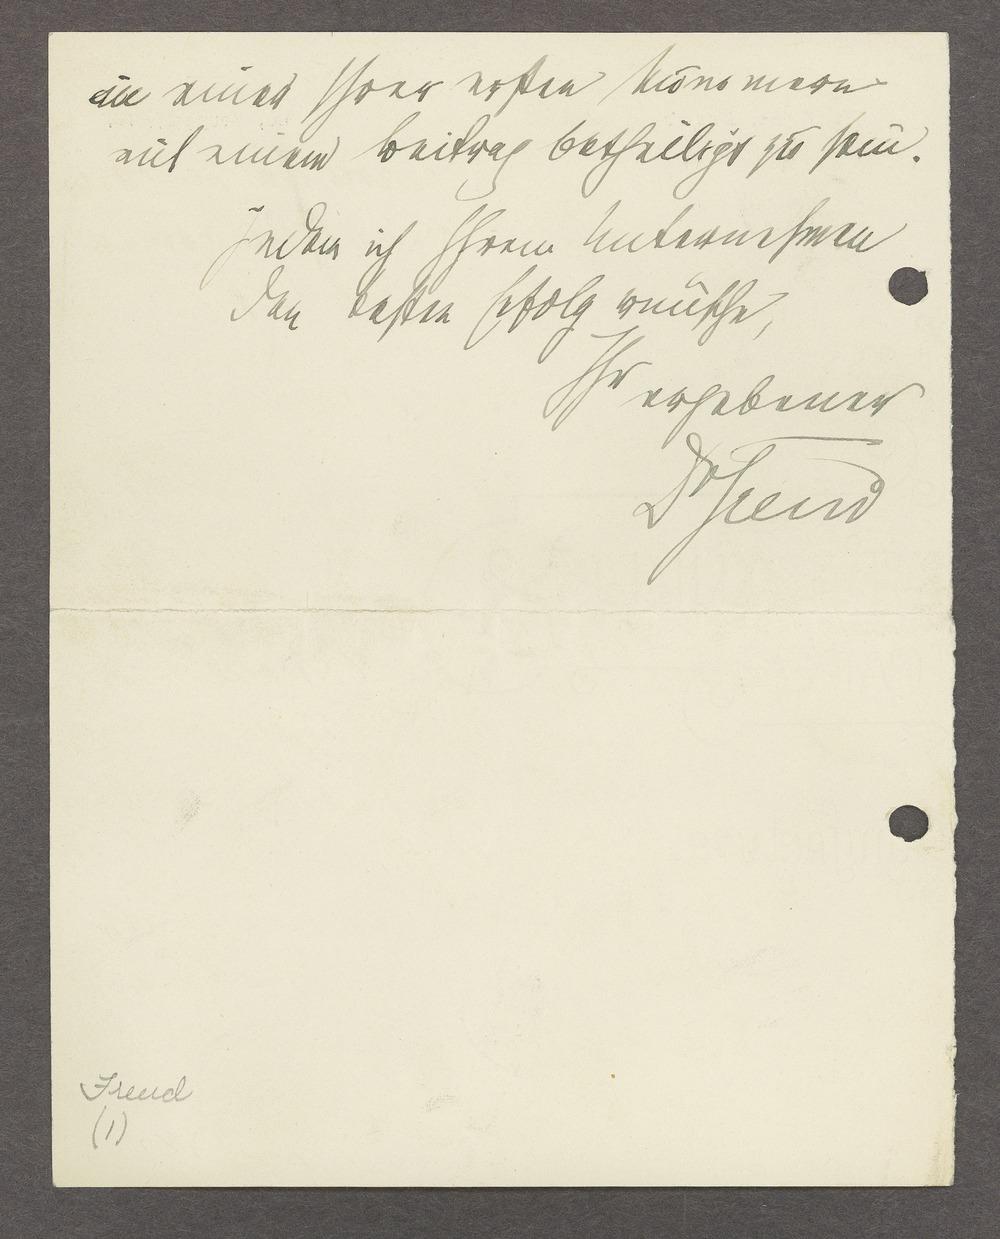 Sigmund Freud correspondence - 2